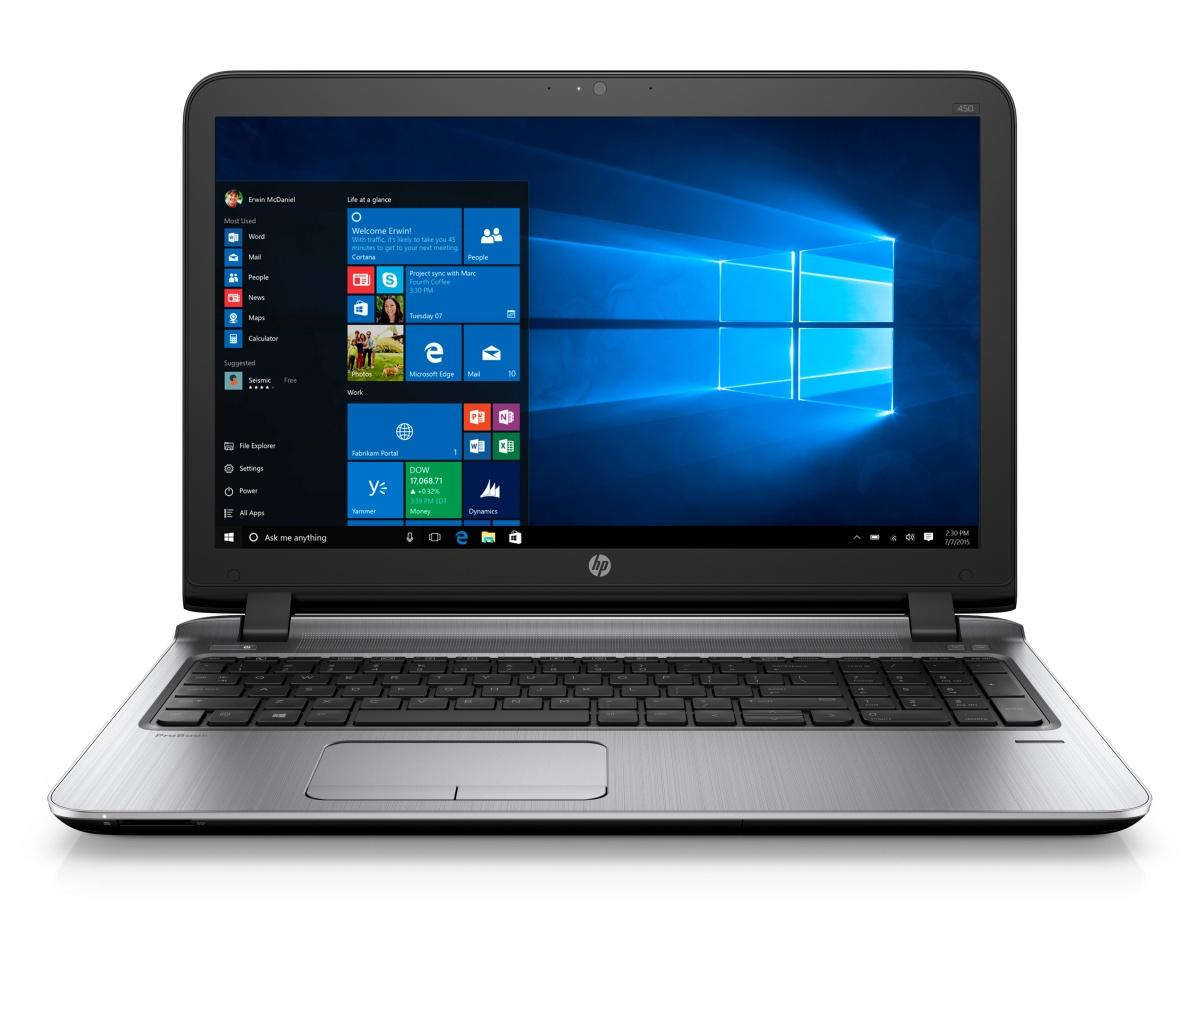 "HP ProBook 450 G3 15.6"" FHD/i3-6100U/4GB/256SSD/DVD/VGA/HDMI/RJ45/WIFI/BT/MCR/FPR/1Rservis/7+10P"